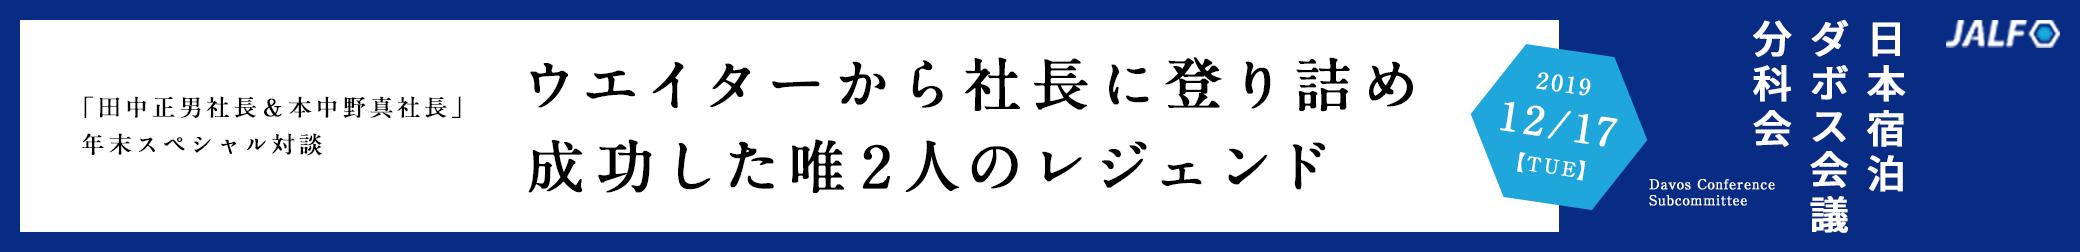 日本宿泊ダボス会議分科会「田中正男社長&本中野真社長」年末スペシャル対談